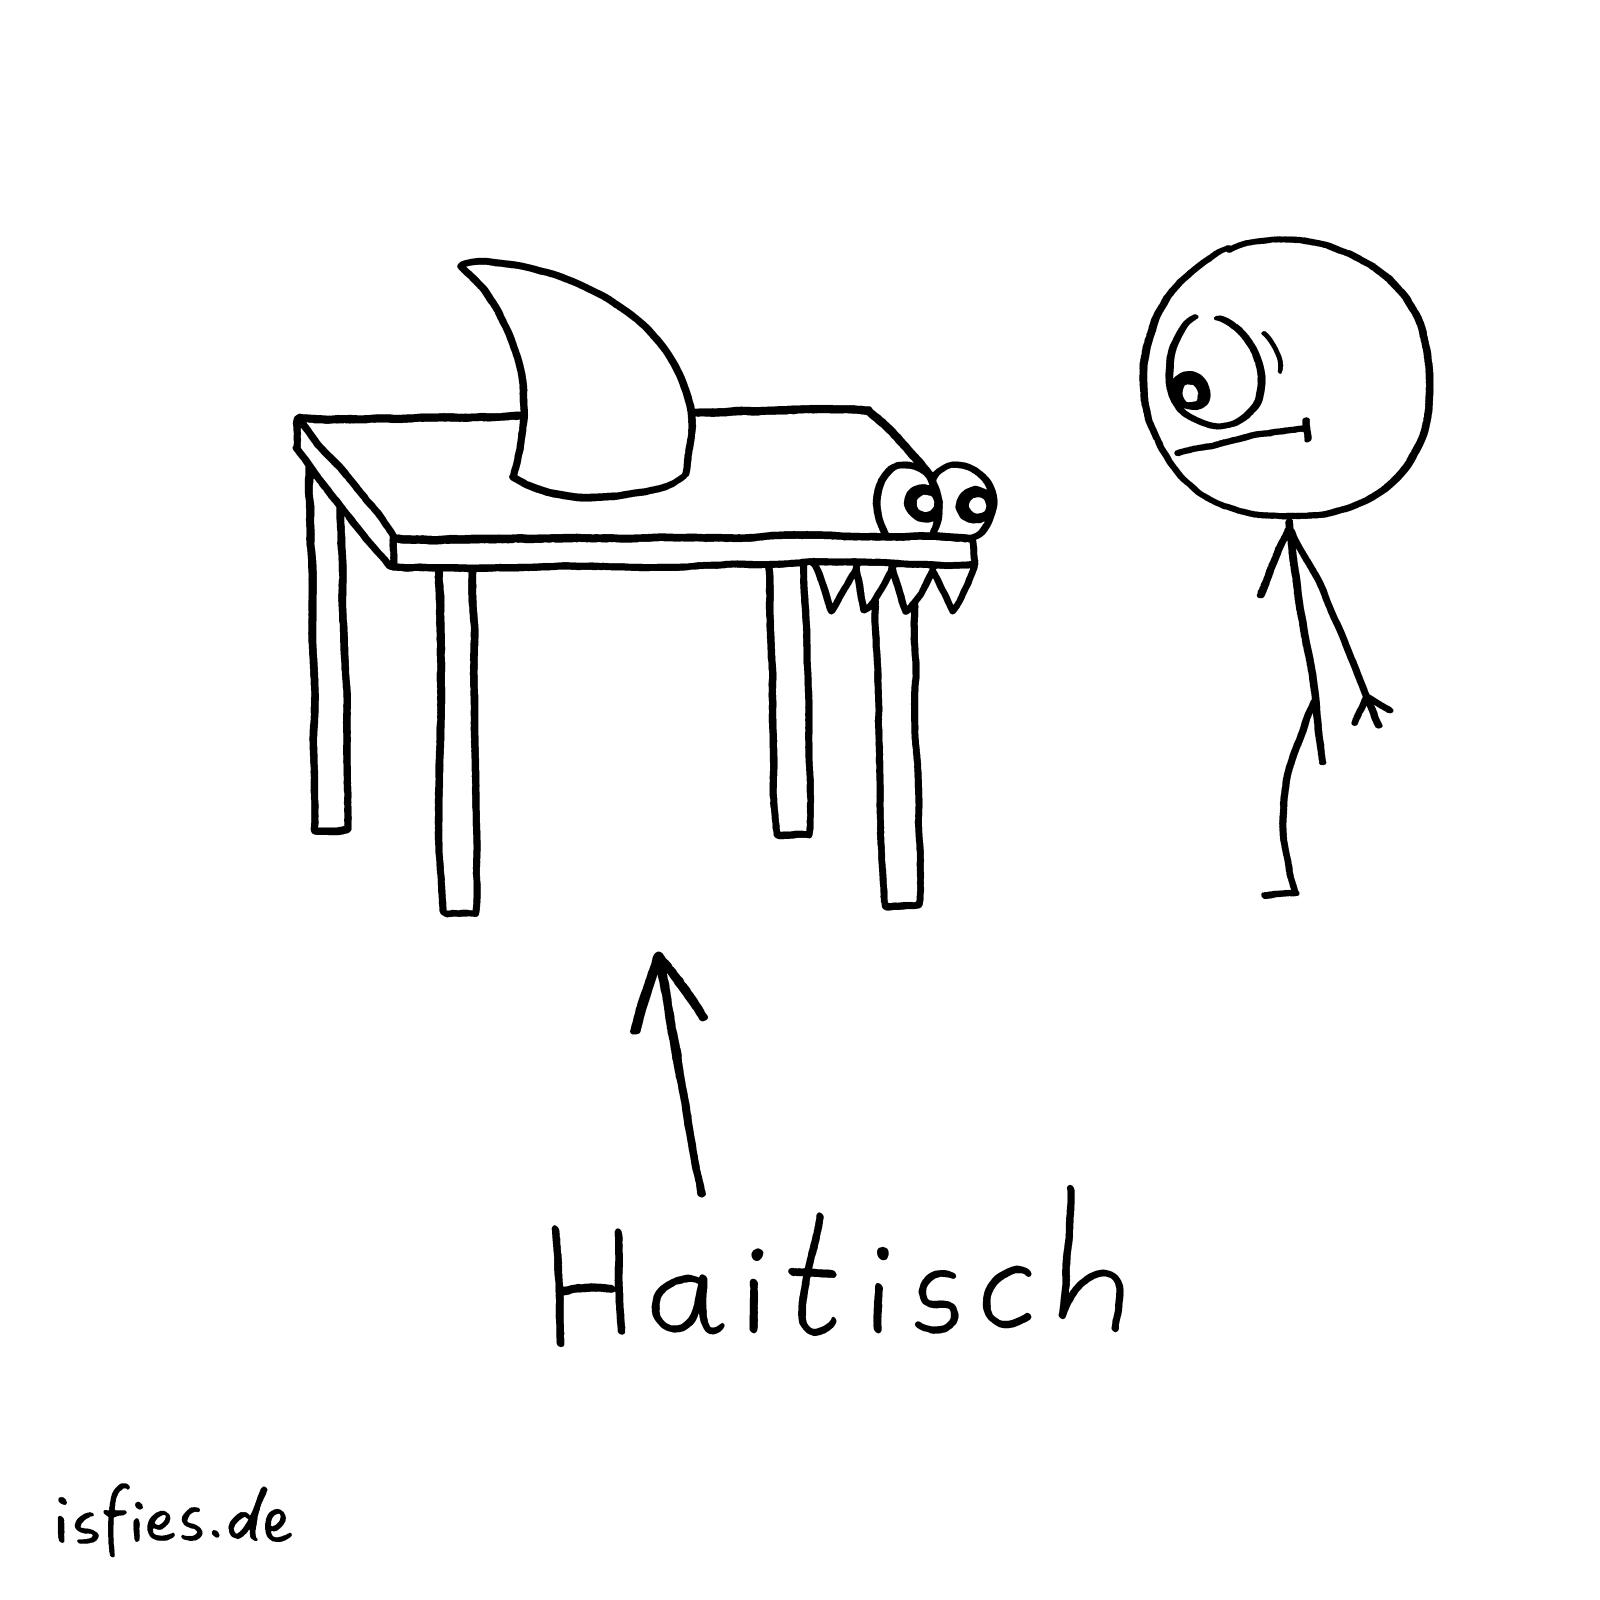 Haitisch isfies Cartoon